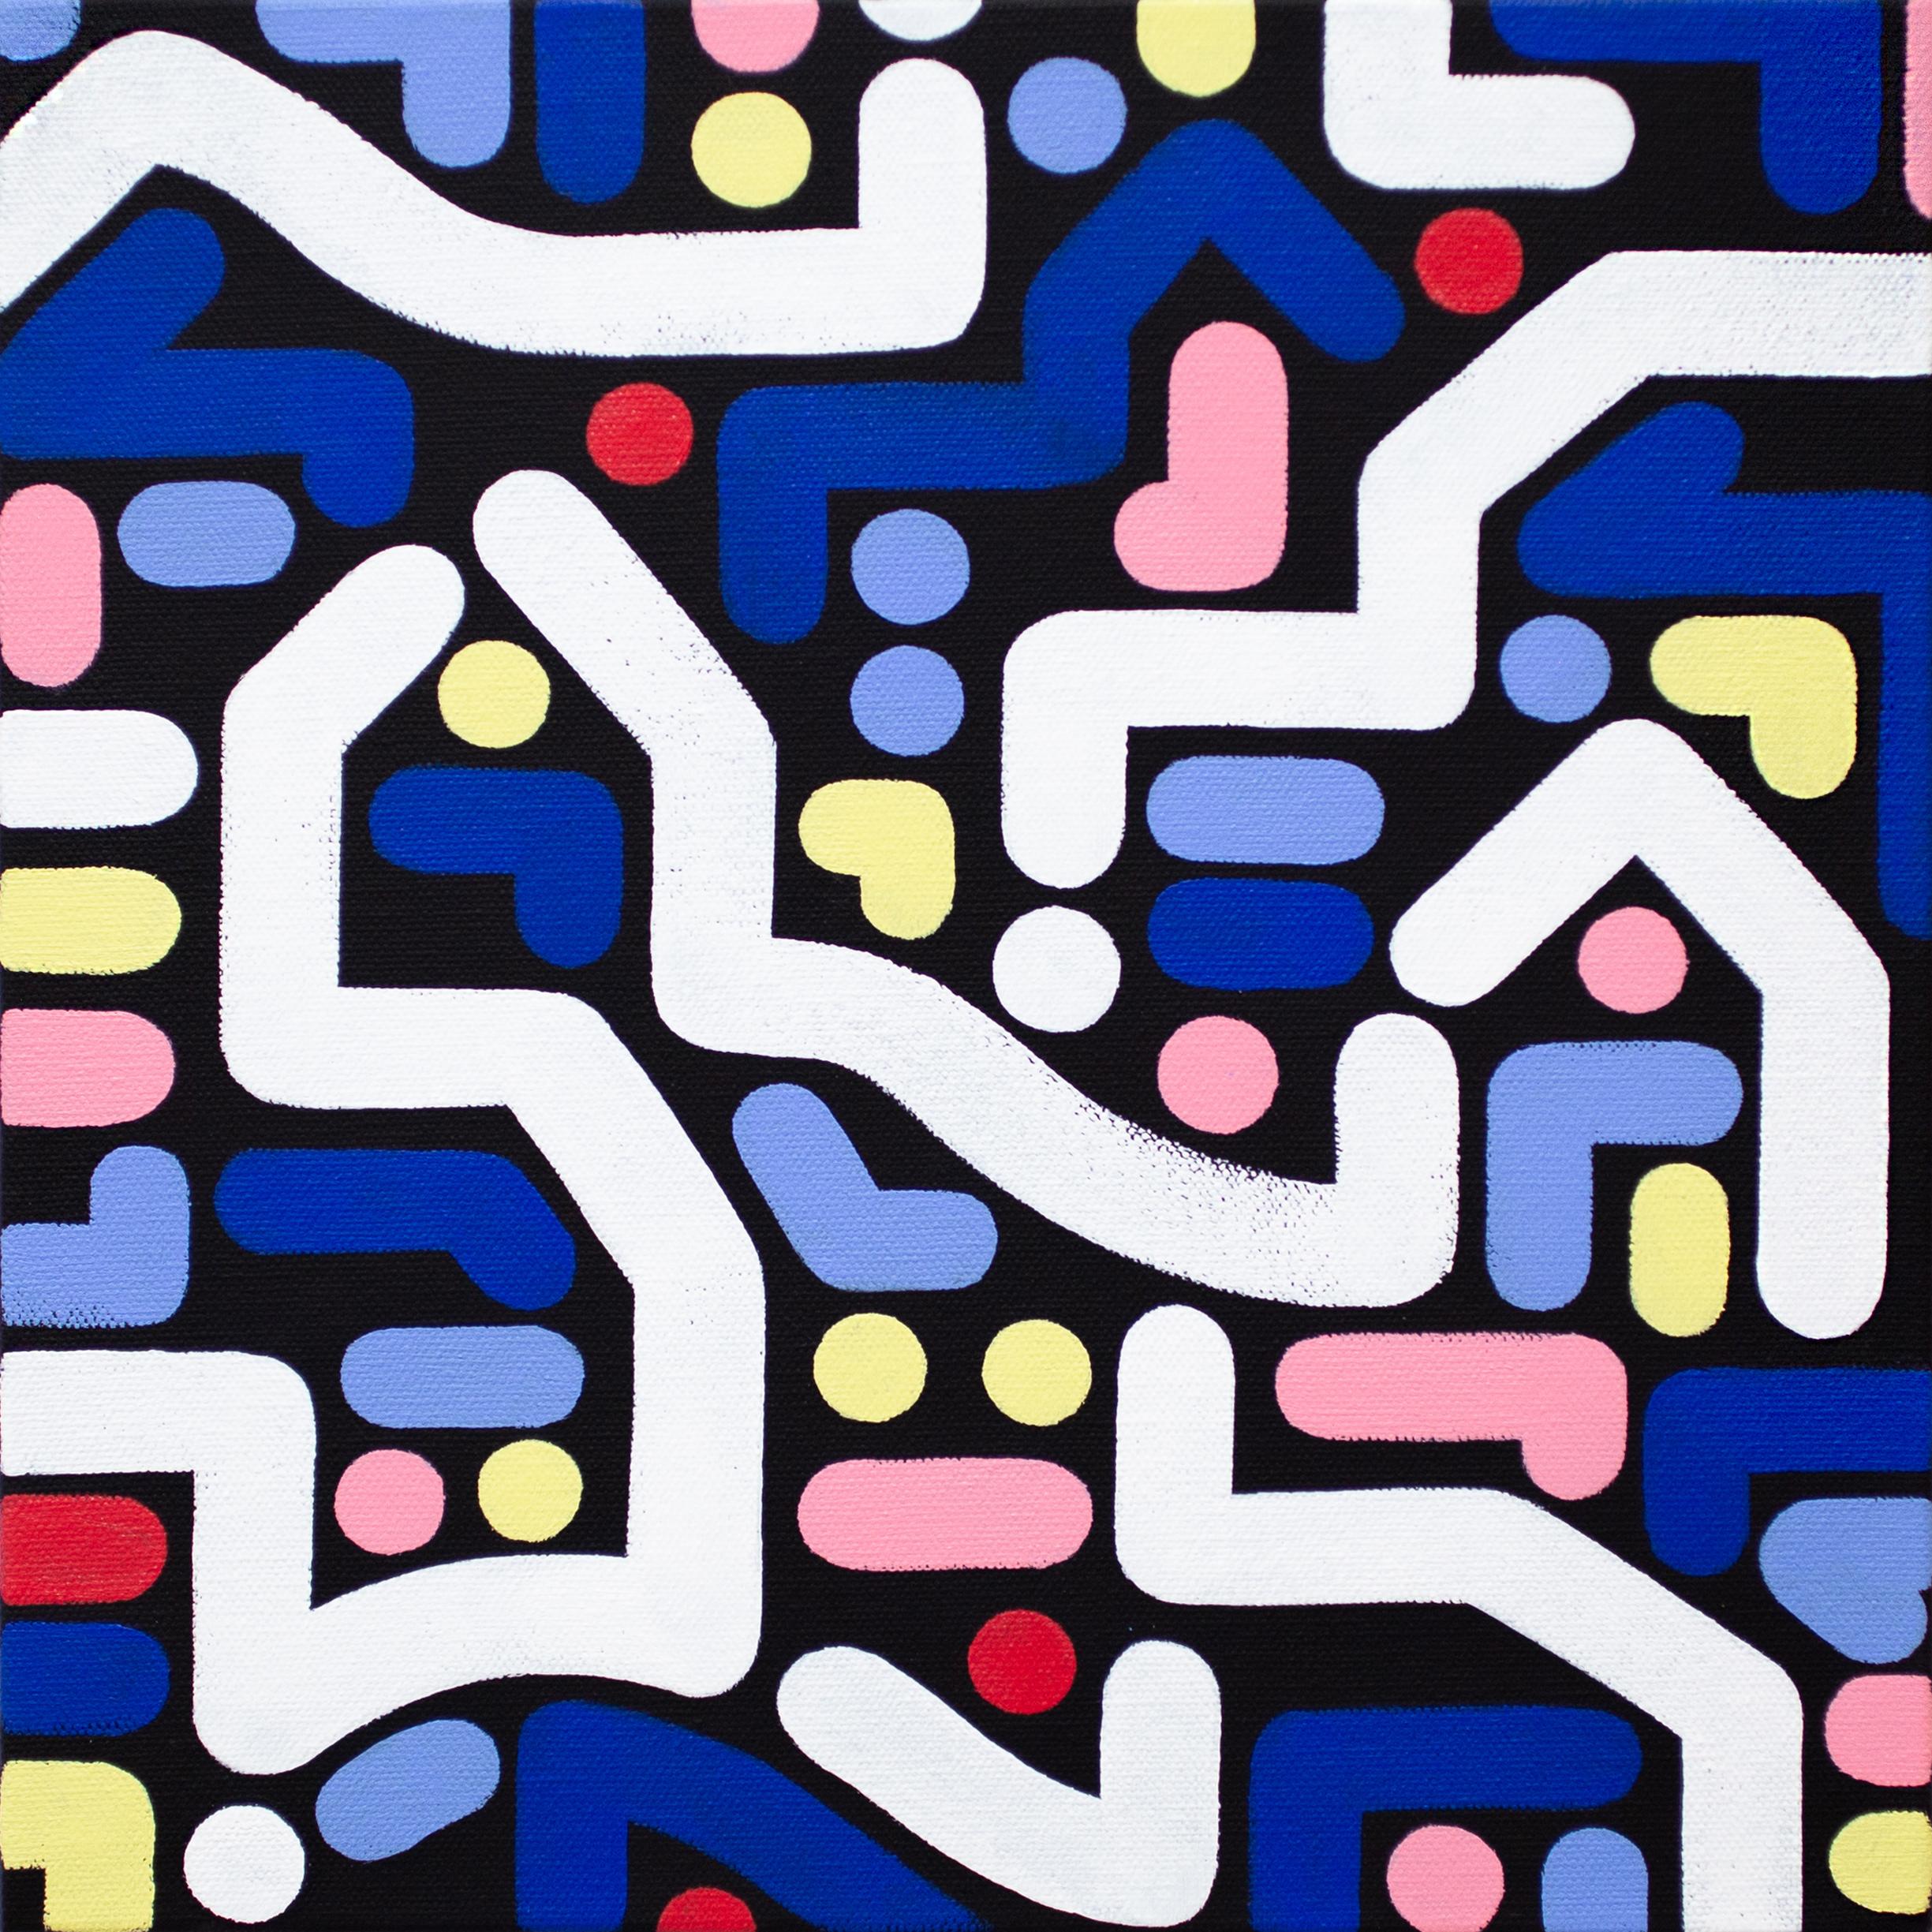 Yoon Hyup, Untitled, 2019, acrylic on canvas, 30×30 cm (2)